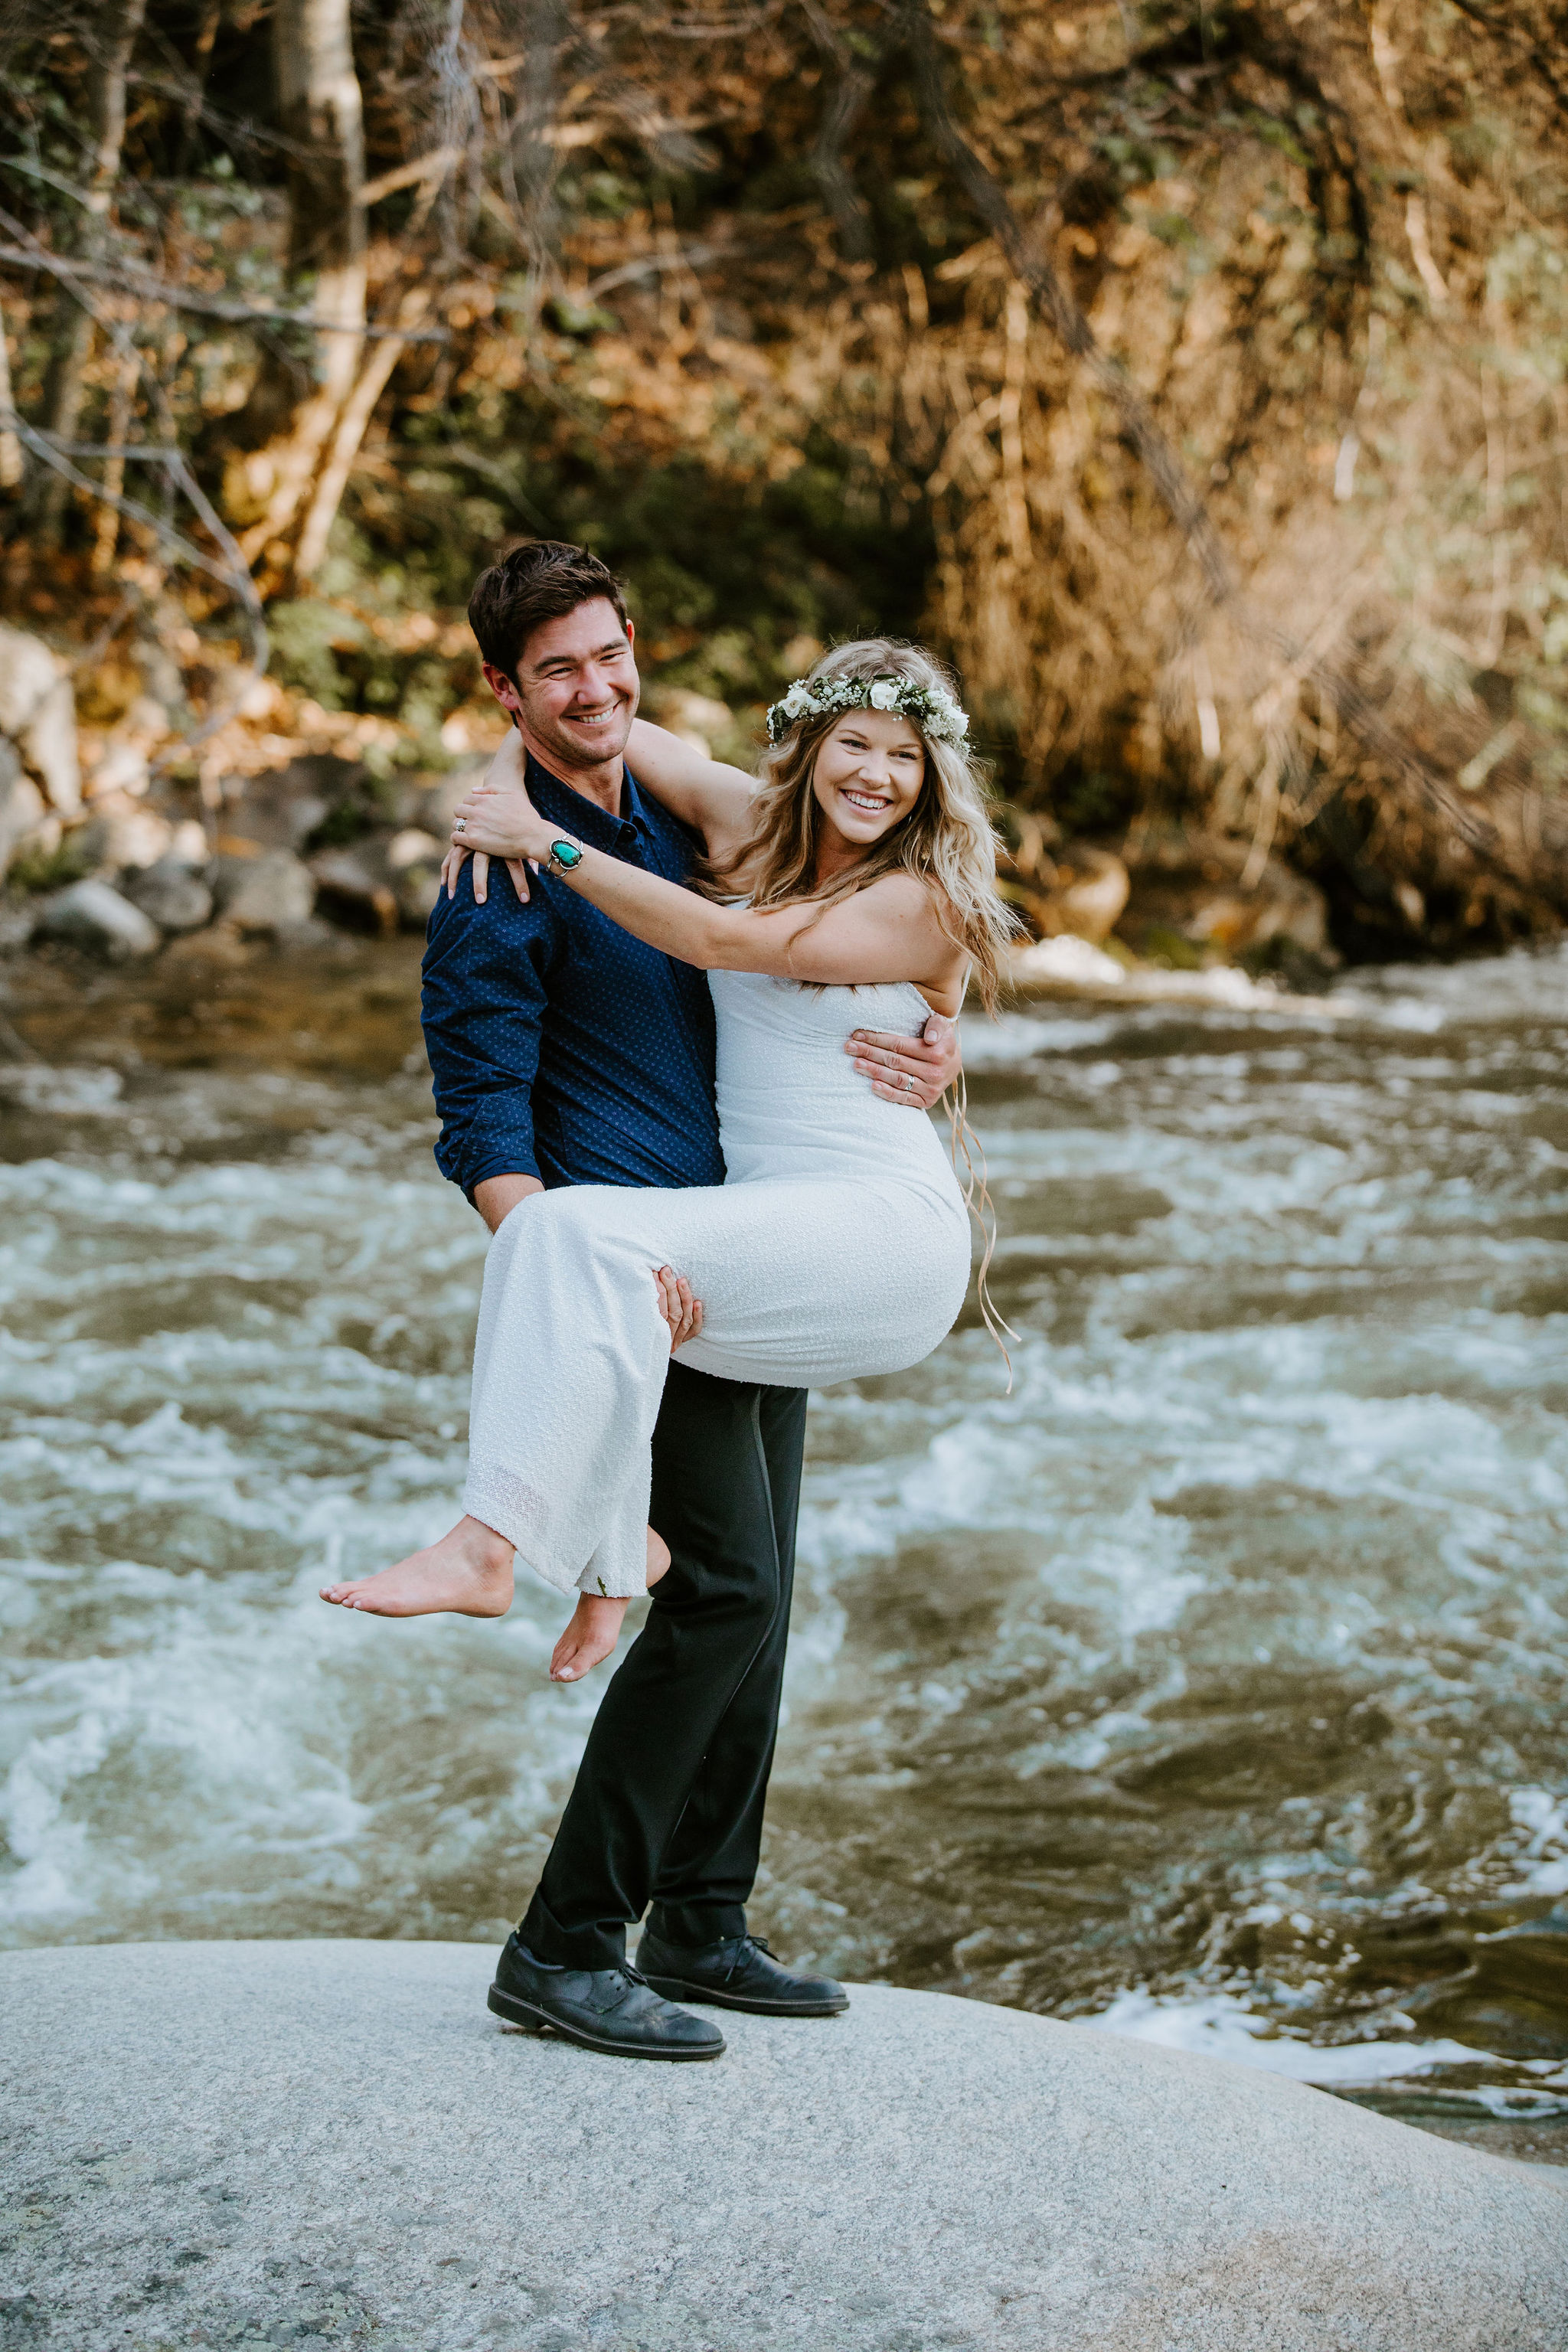 RedwoodRanch_Geoff&LyndsiPhotography_Mike&Amanda_Romantics77.jpg